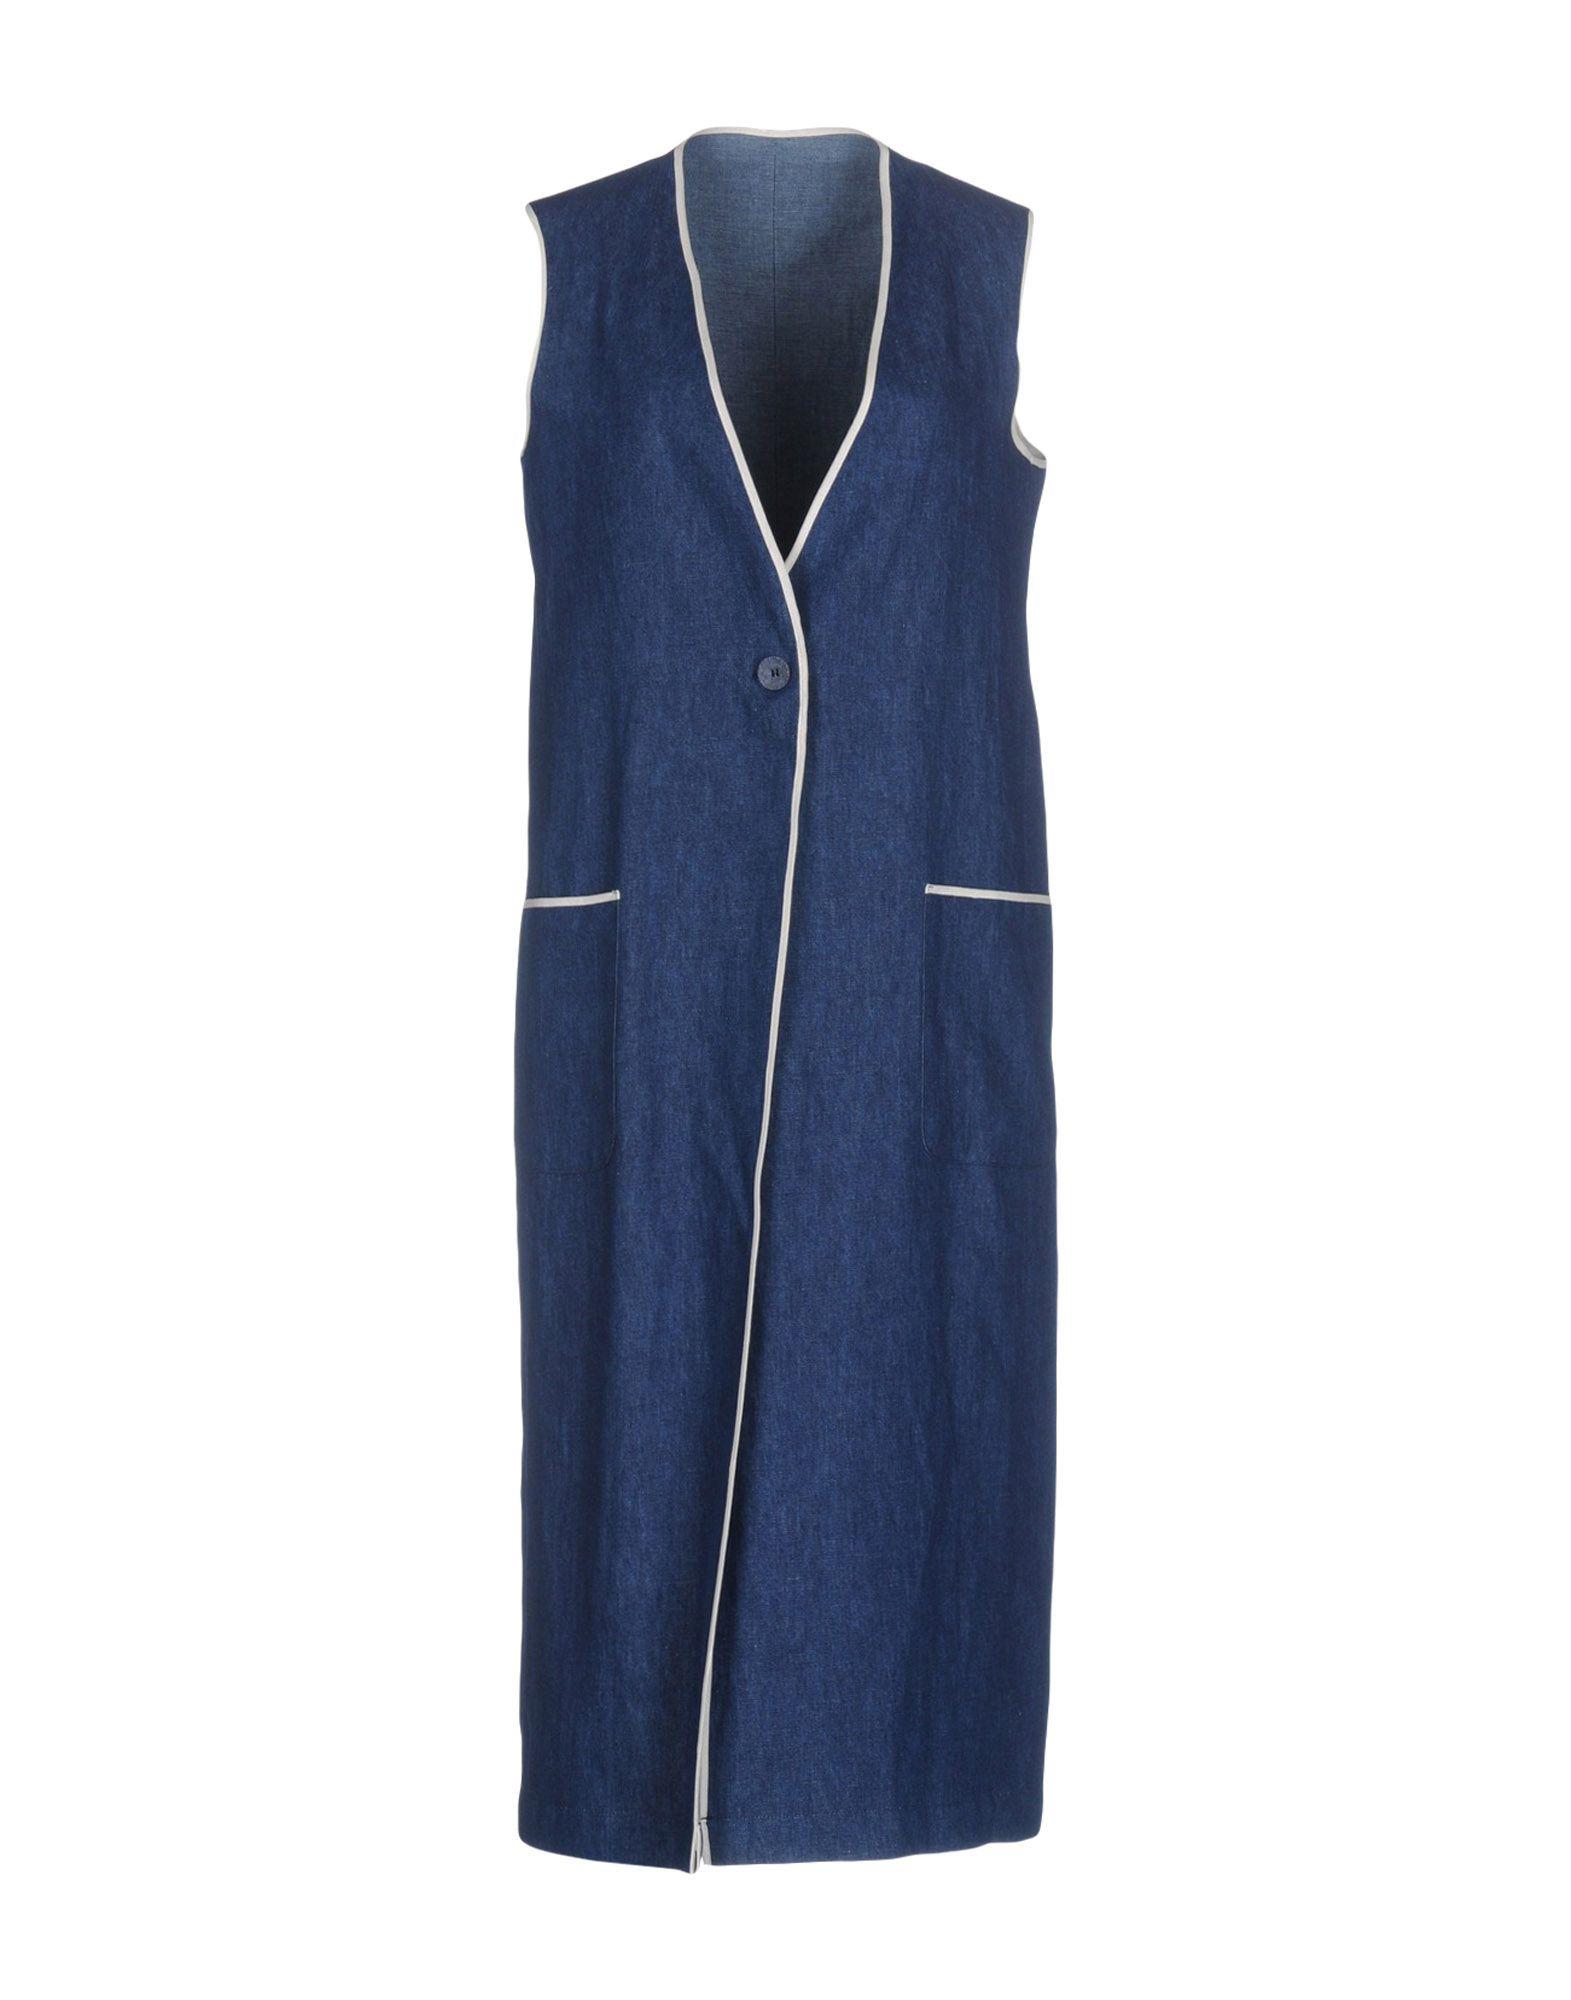 BRIAN DALES Джинсовая верхняя одежда brian bergeron designs москва